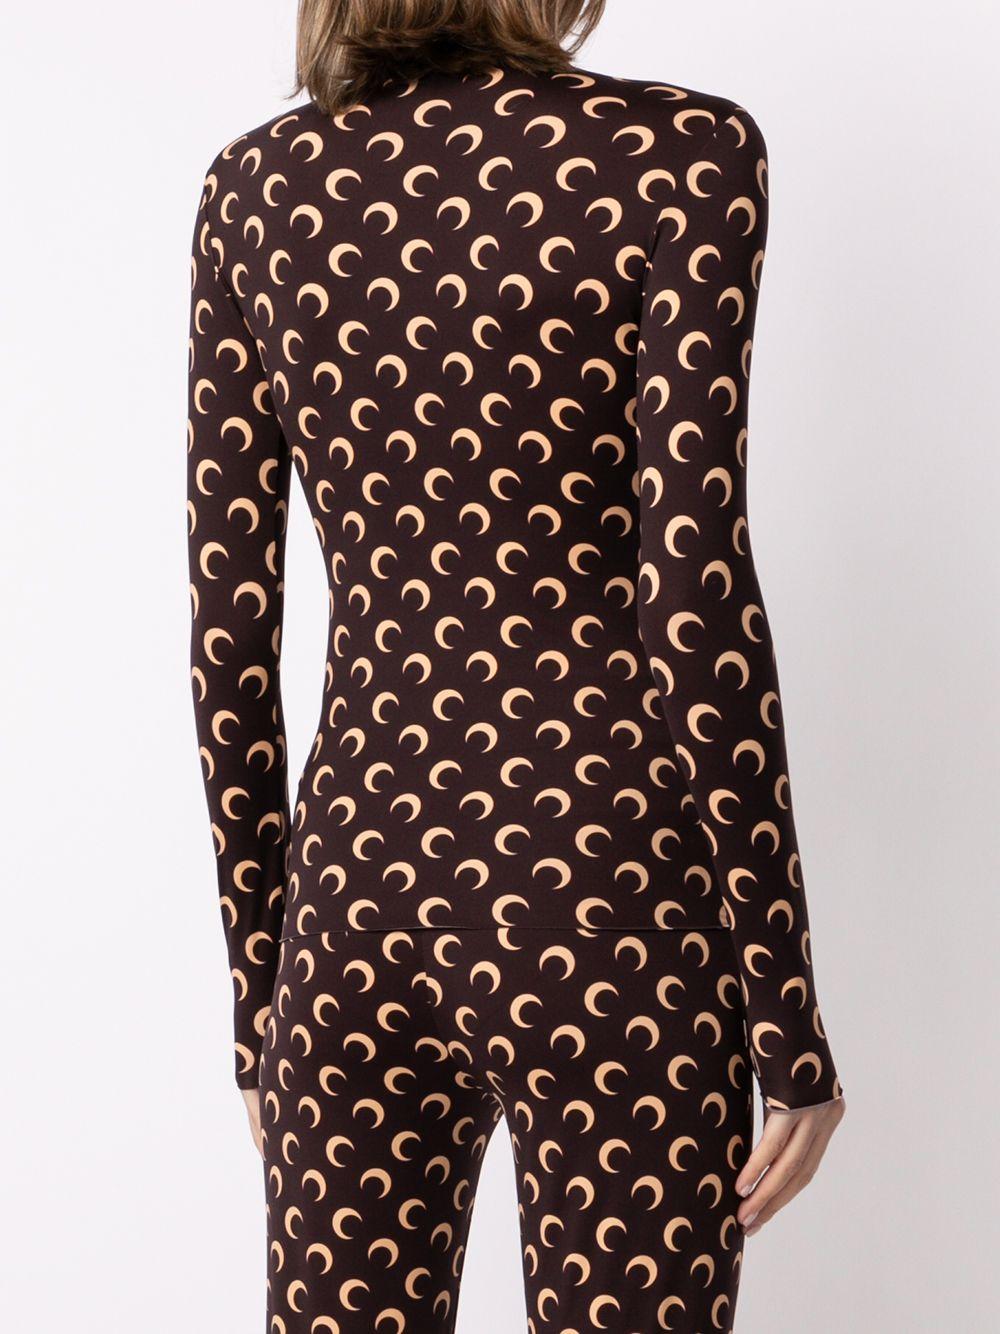 long sleeves t-shirt woman brown MARINE SERRE | T-shirts | T068ICONW08